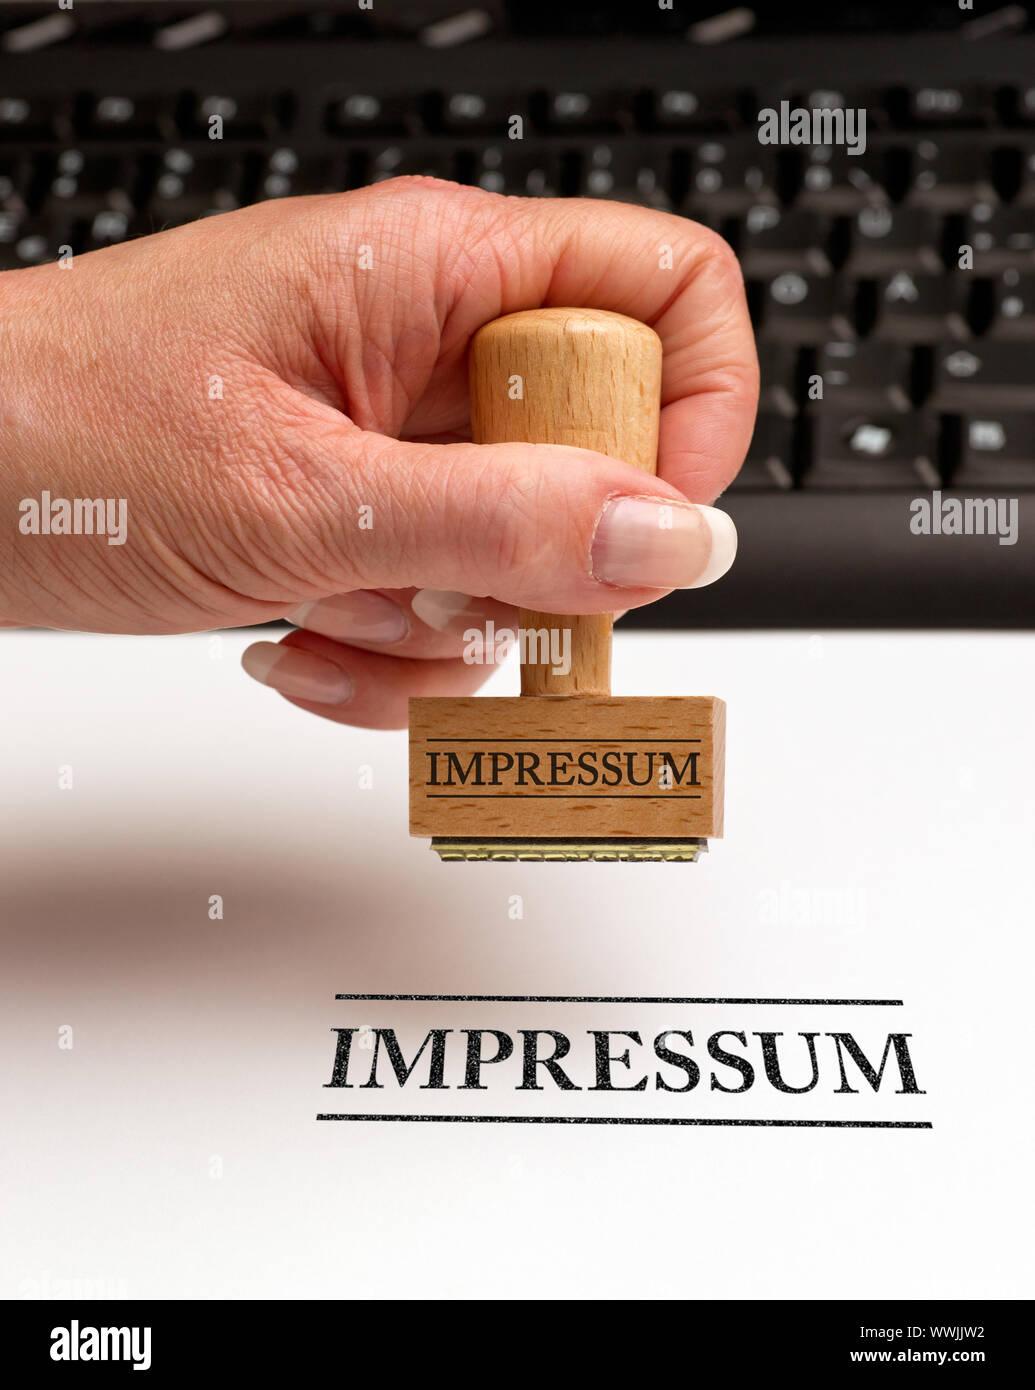 Imprint - Business Concept Stock Photo